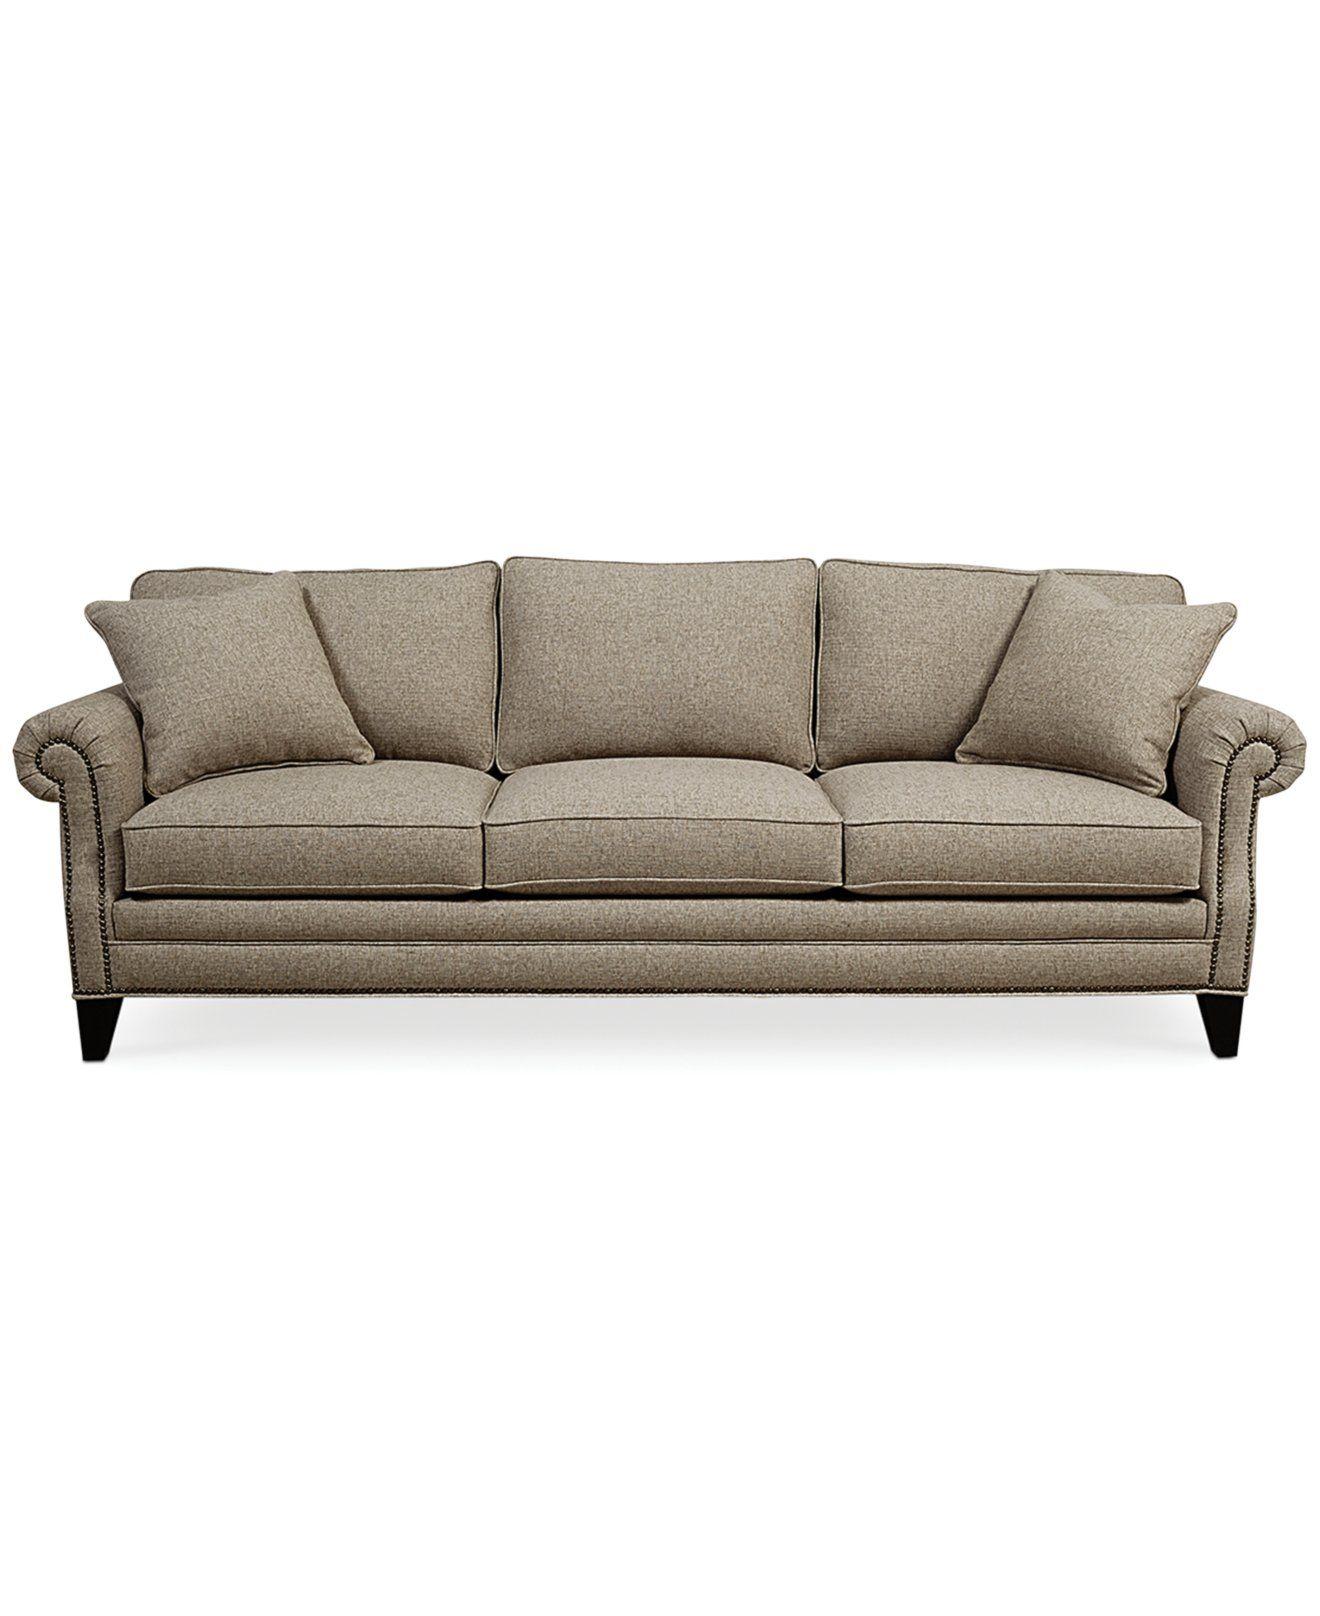 Clarke Fabric 2 Piece Sectional Queen Sleeper Sofa Bed Shop All